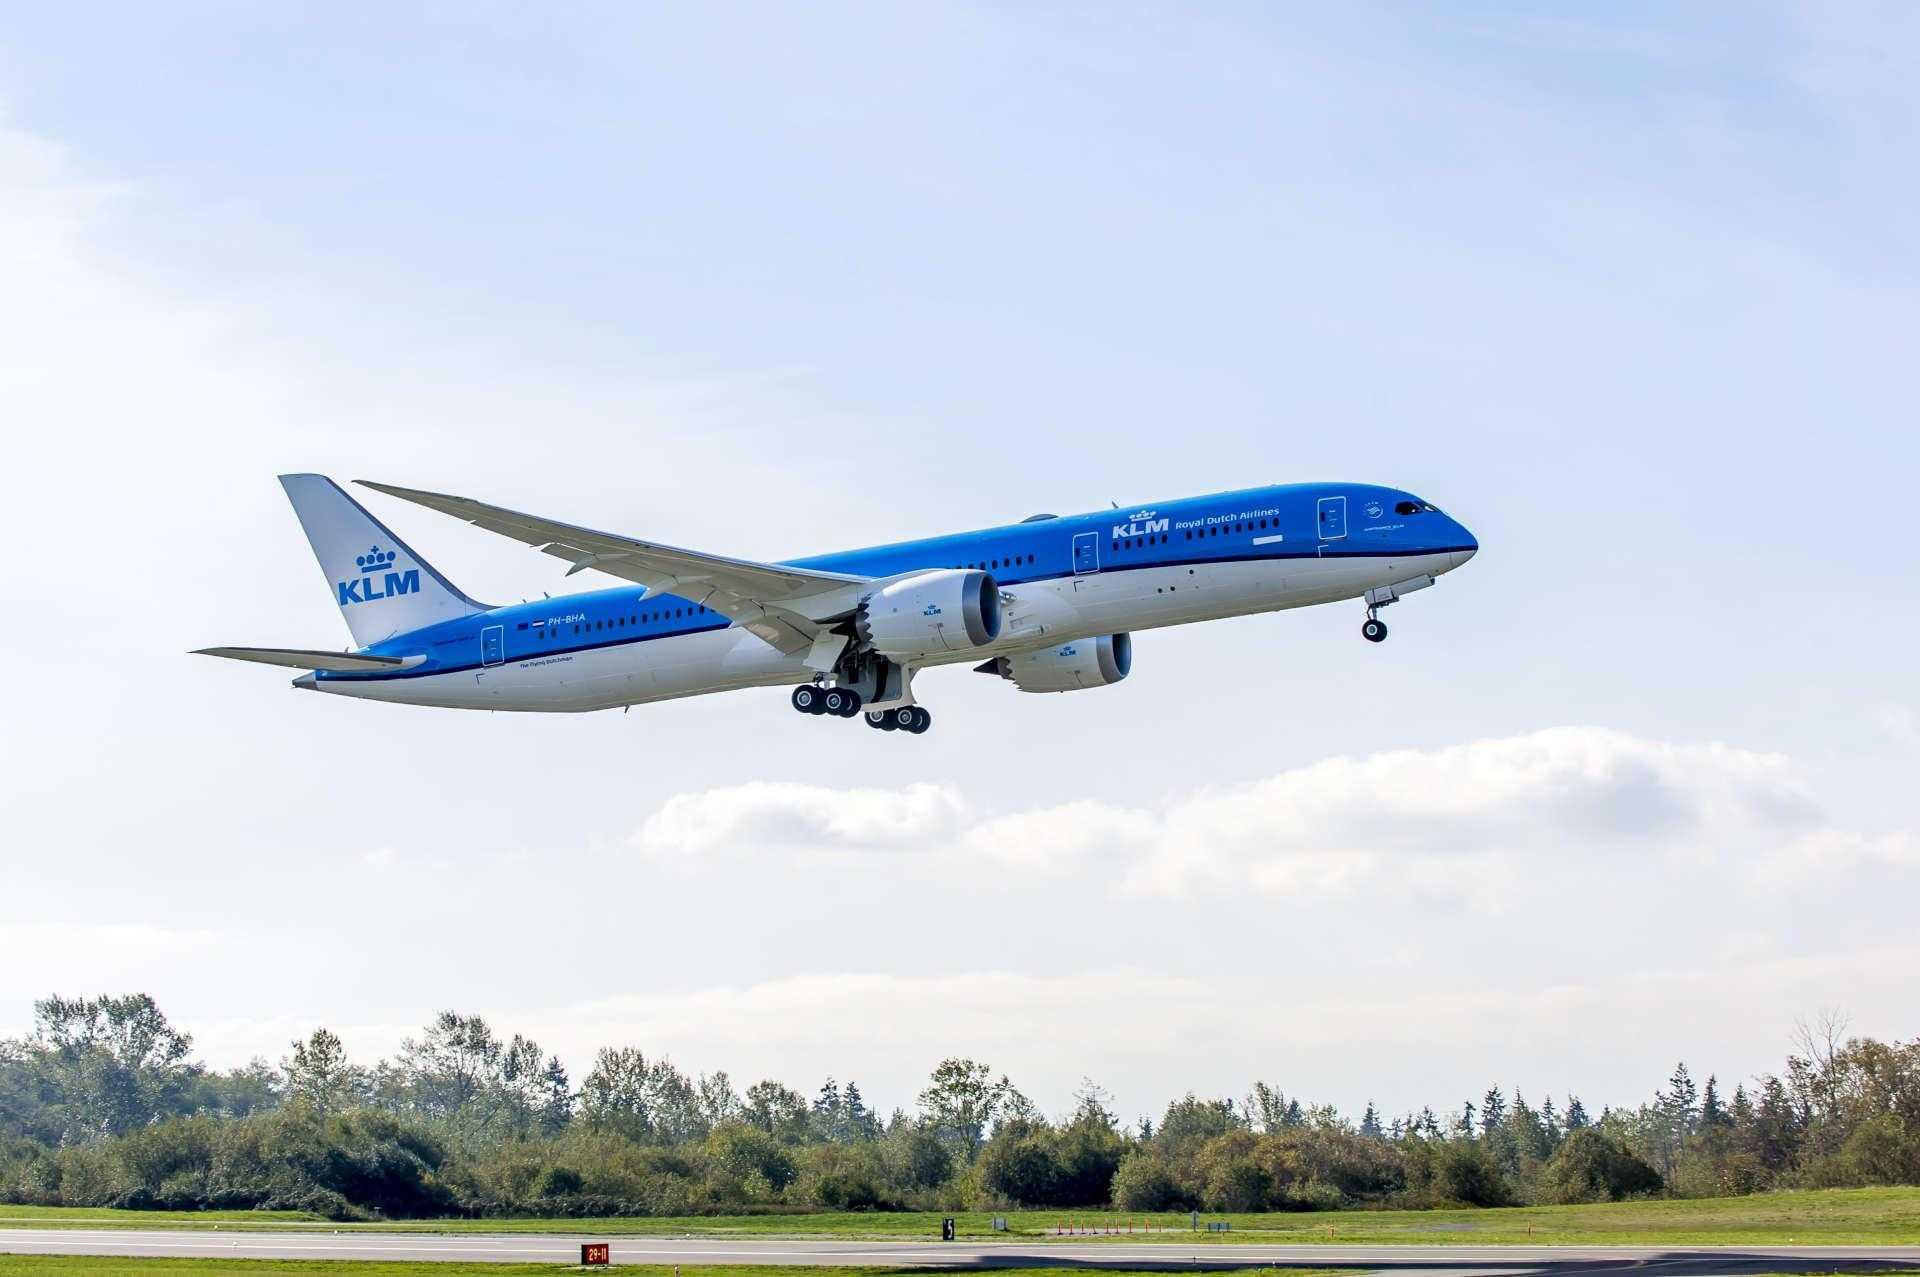 787-9 KLM